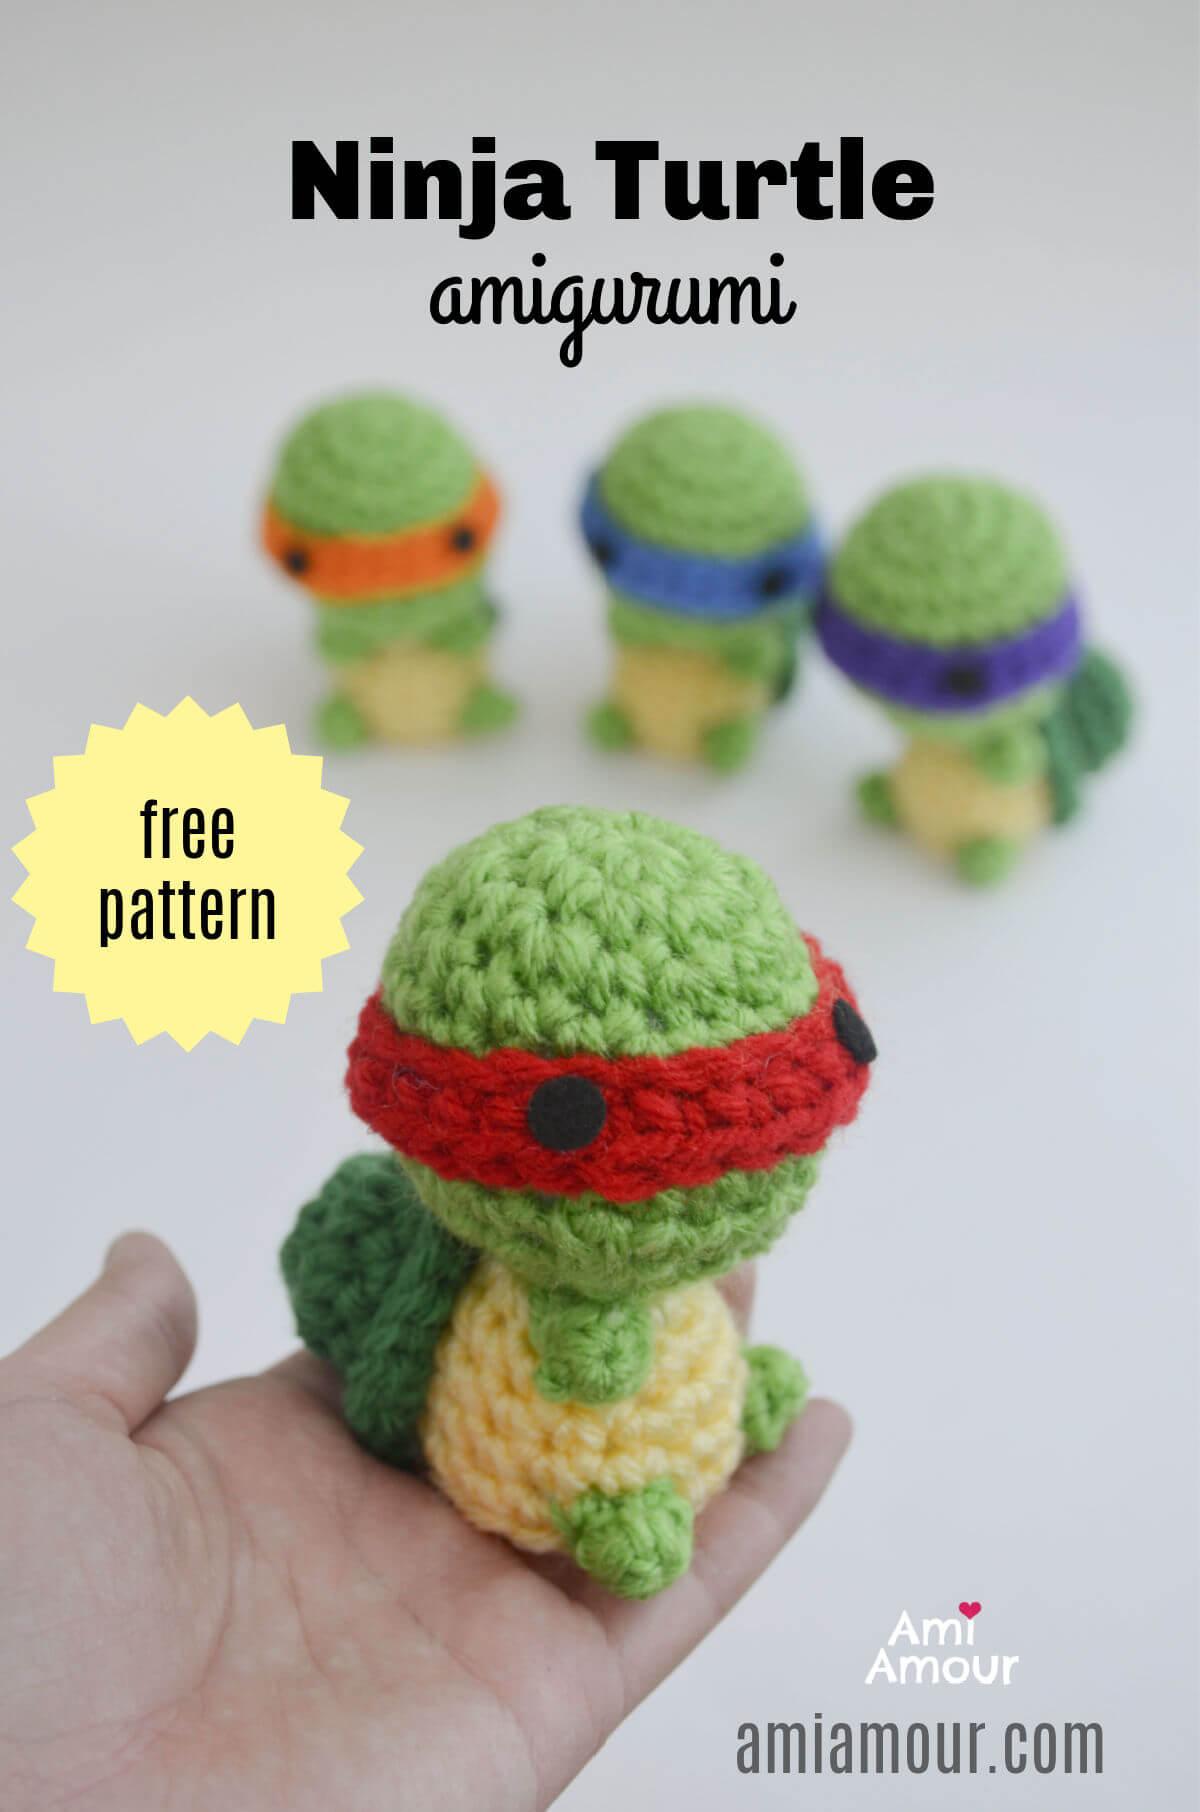 Nina Turtle - Free Amigurumi Pattern